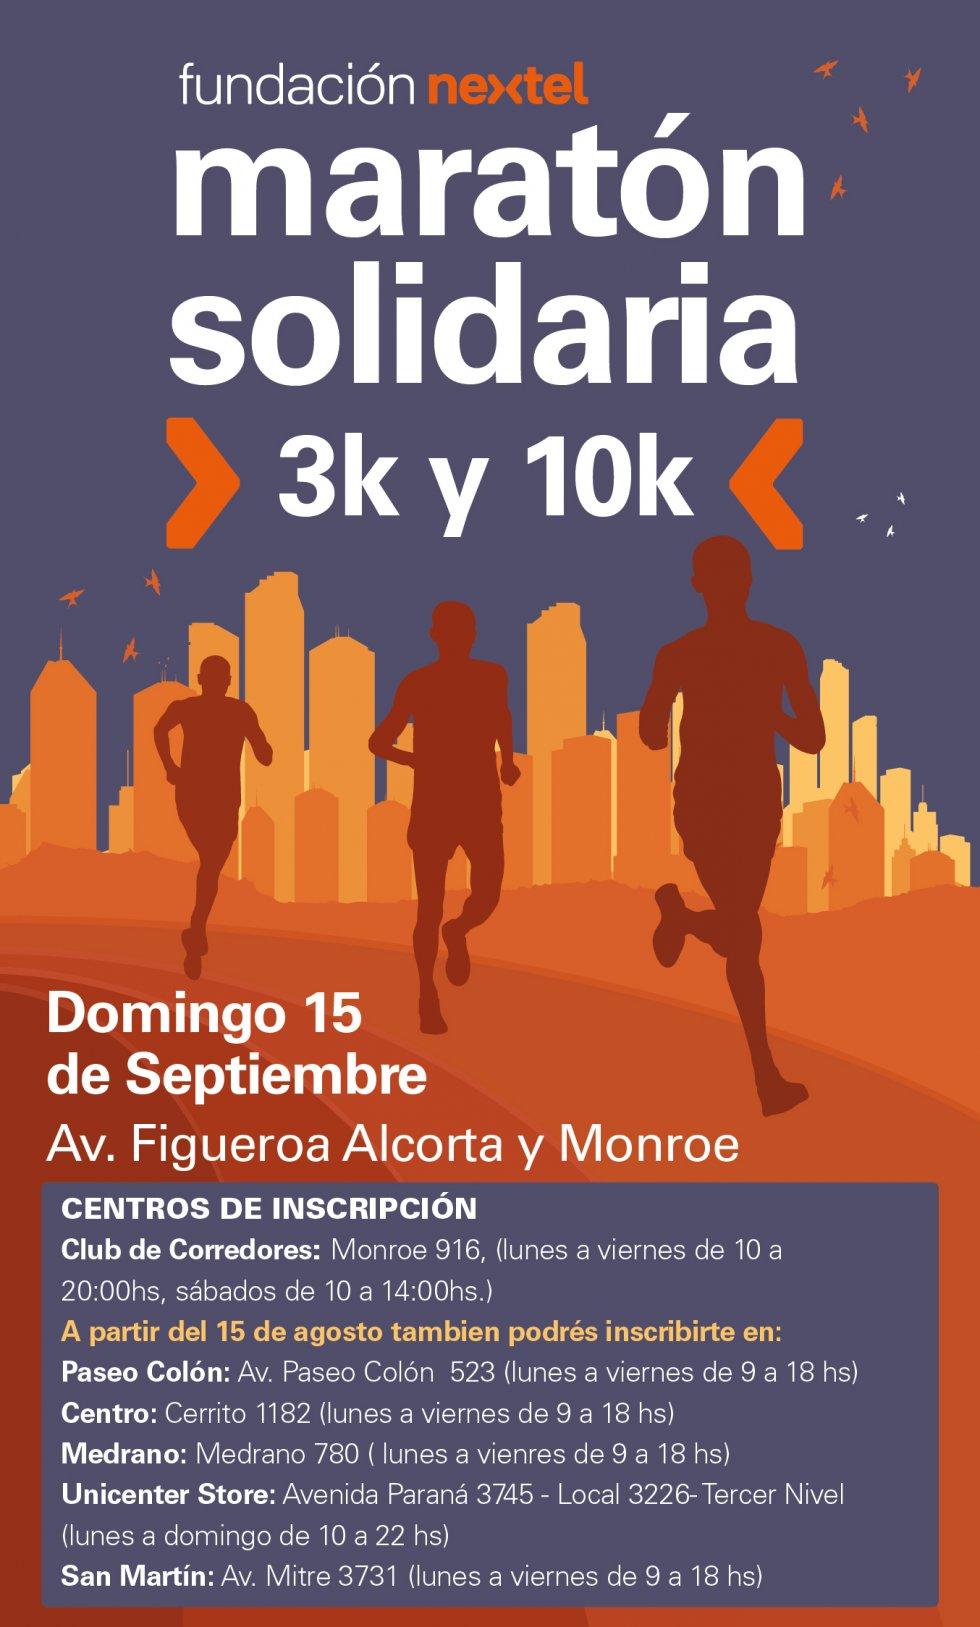 Maraton Fundacion Nextel